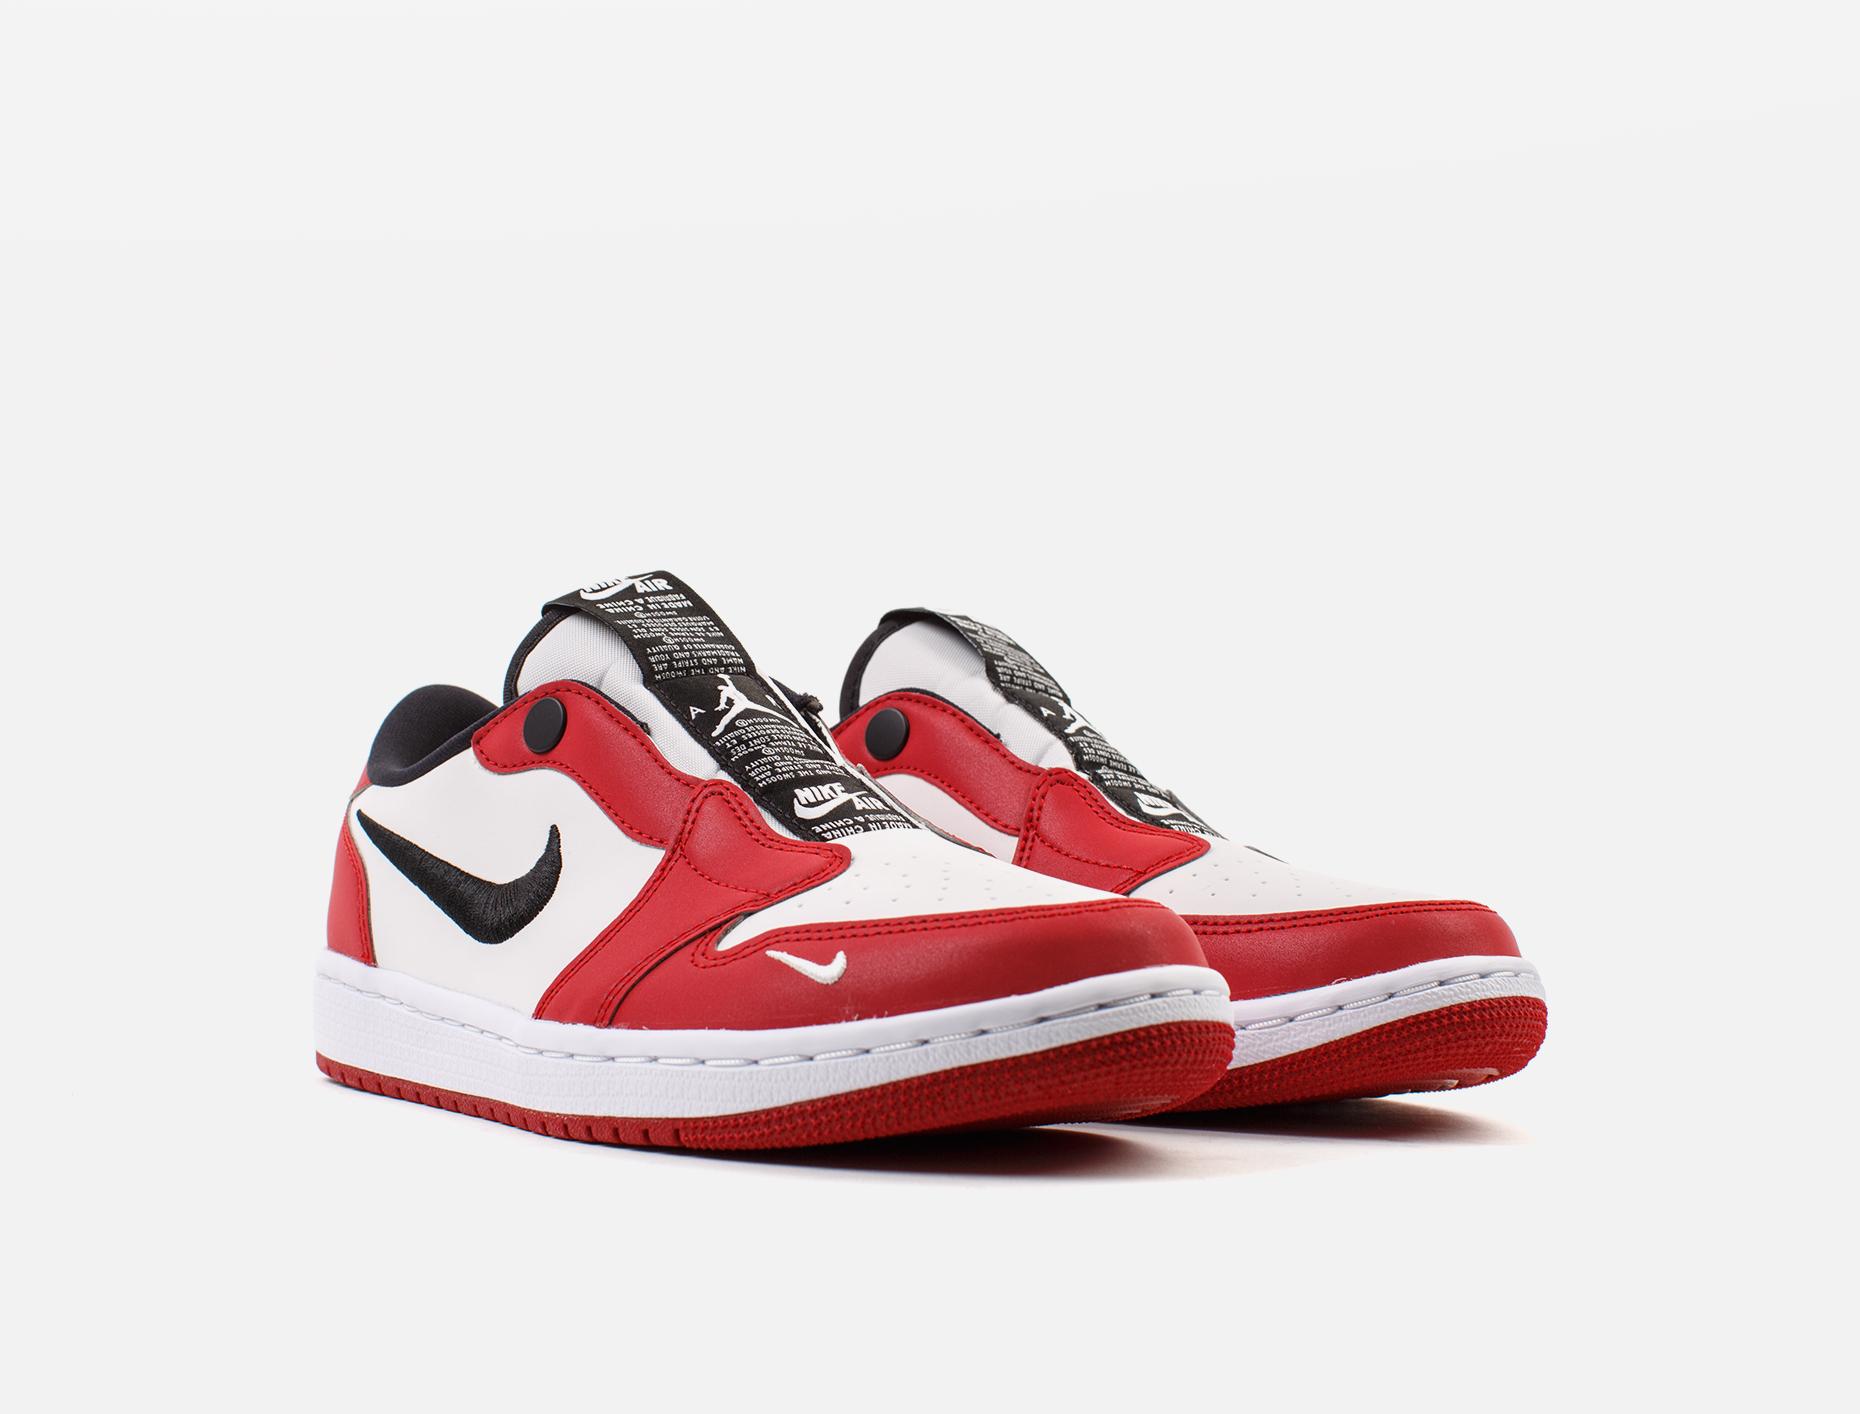 7b0858fd182ecd ... Preview  x Sheila Rashid Air Jordan 1 Retro Low Sneaker ...